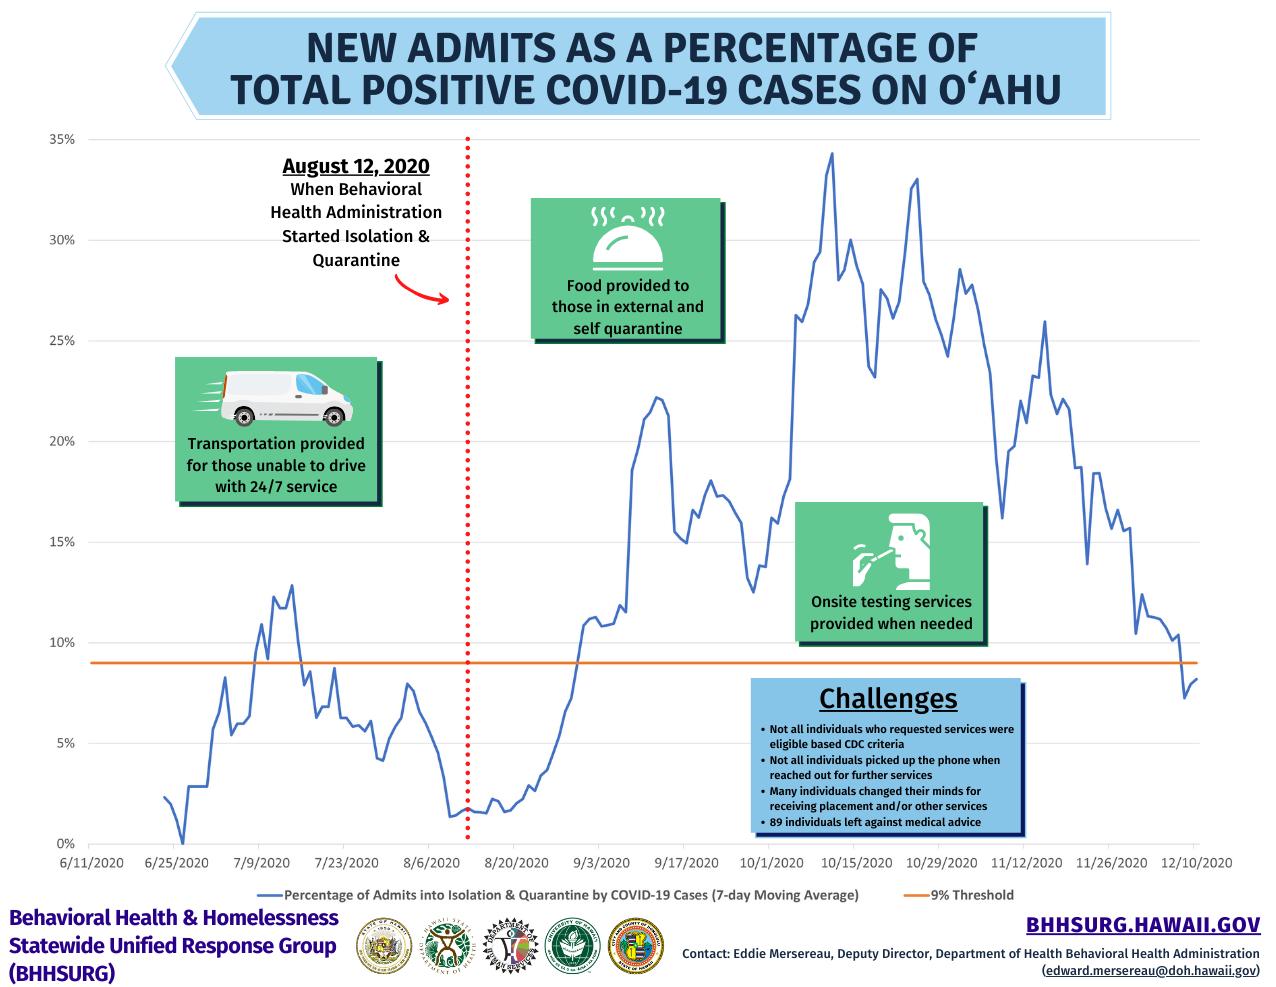 Iso-Quar infographic data page 2 (Aug-Dec 2020 data)